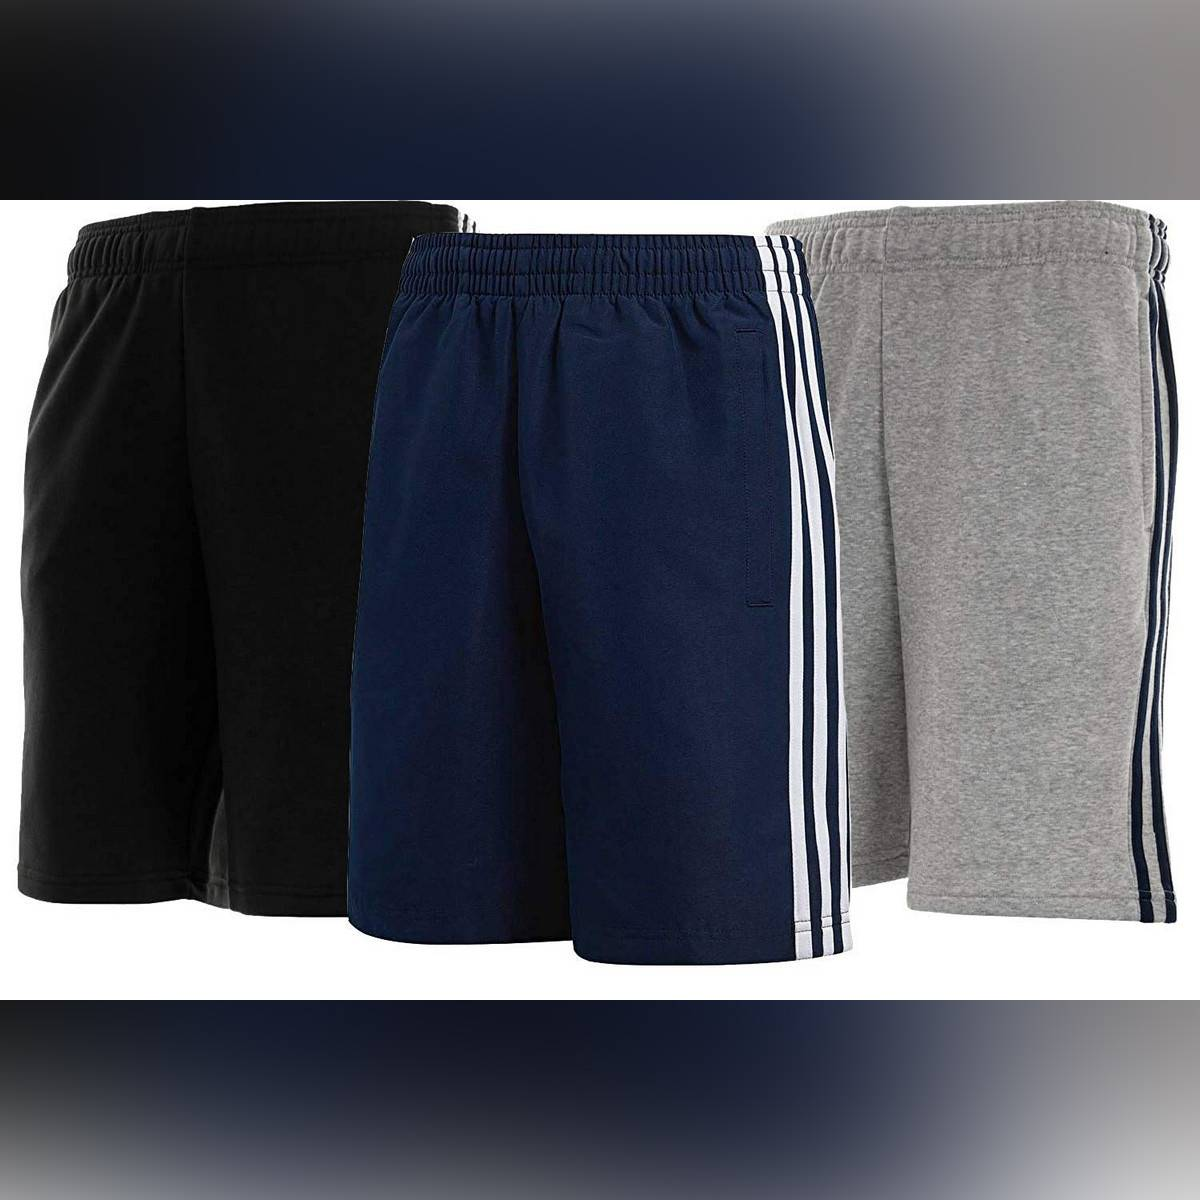 Cotton Fleece Stripes Shorts for Men